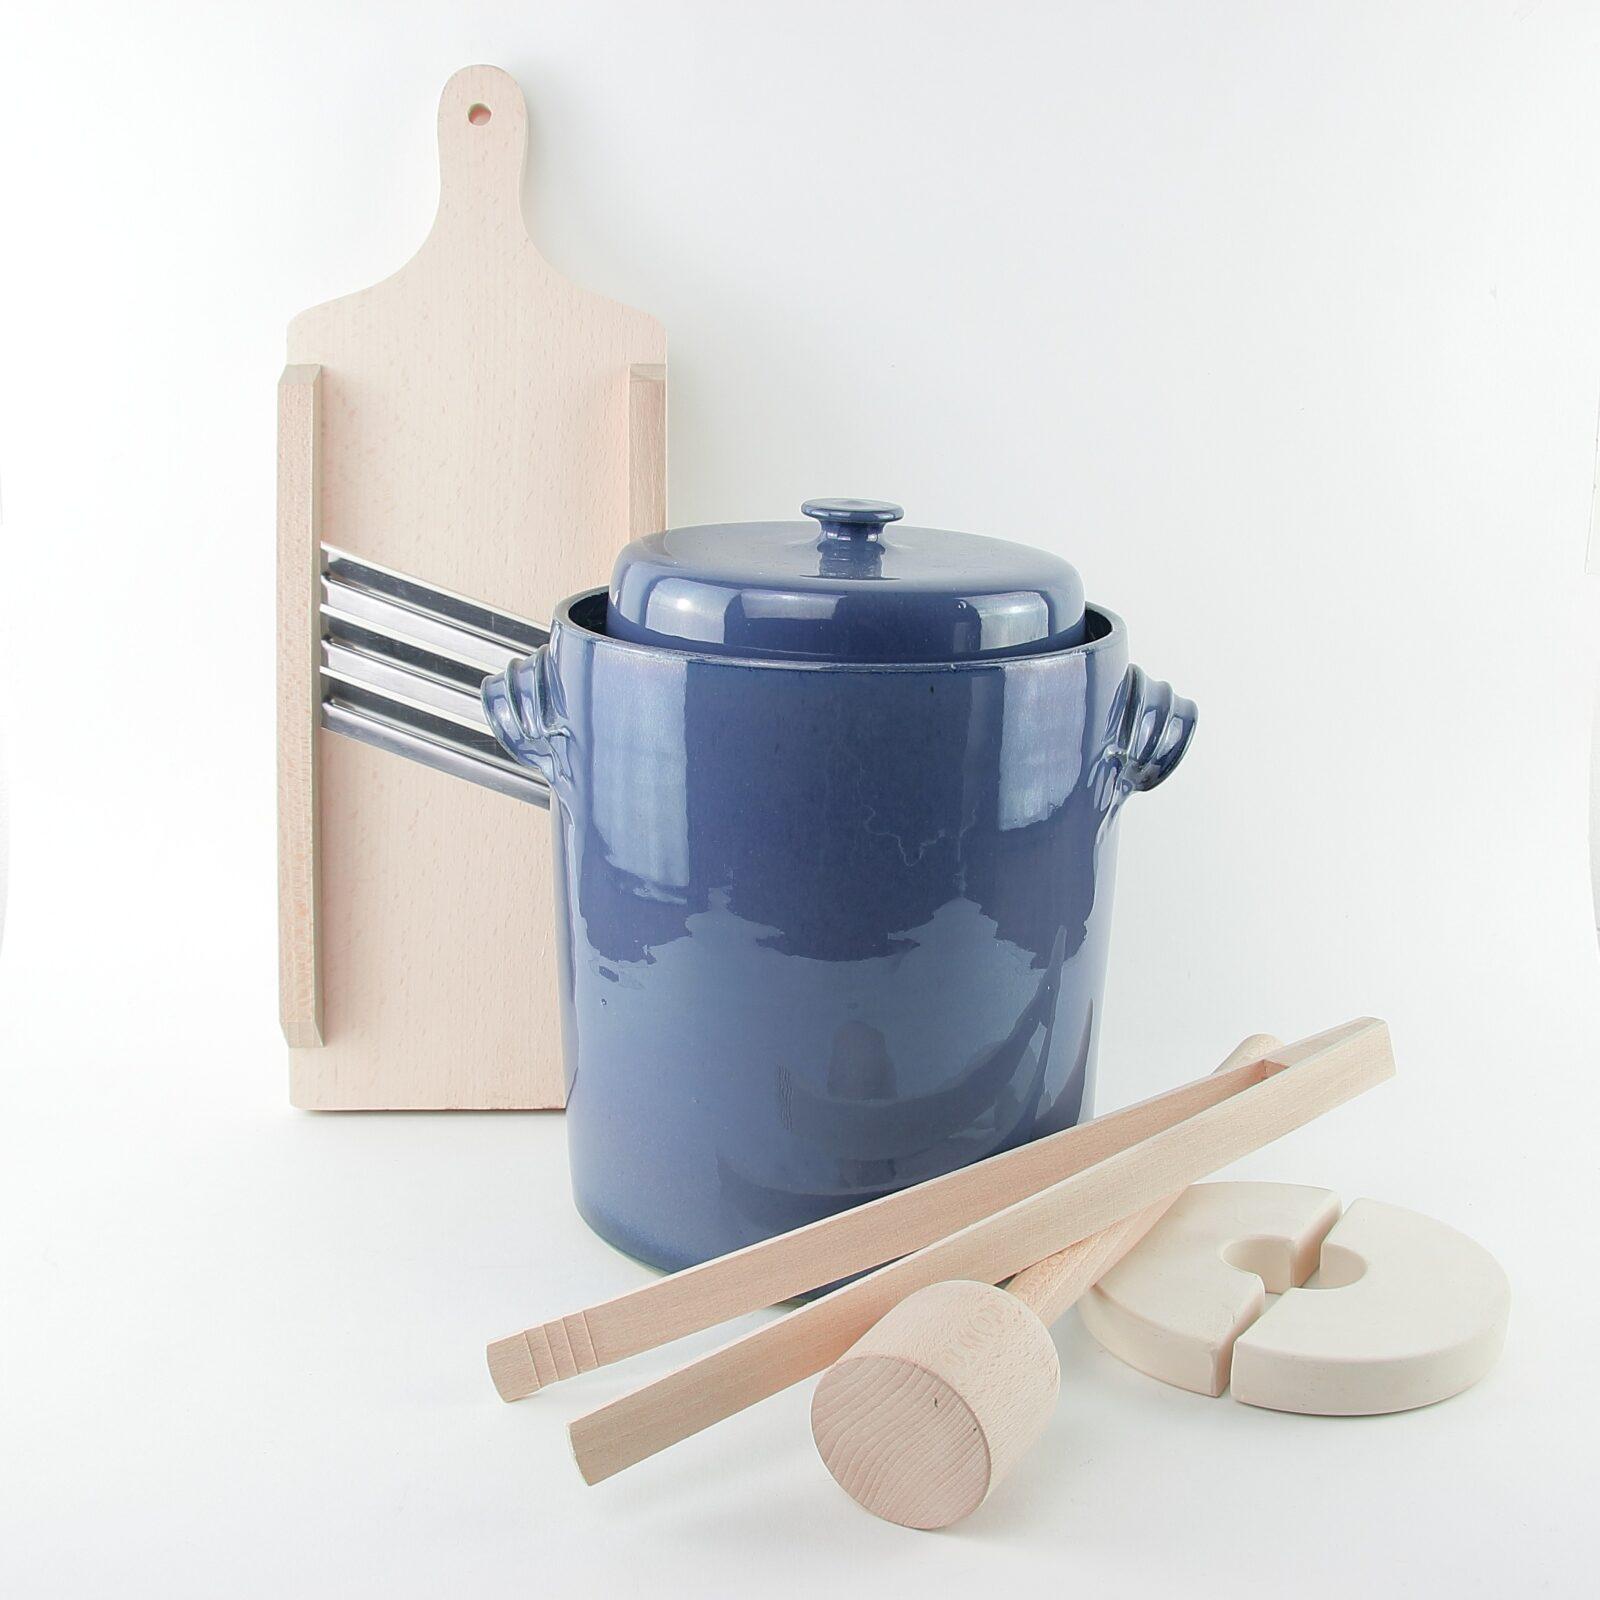 4 litre handmade ceramic sauerkraut crocks with wooden tools